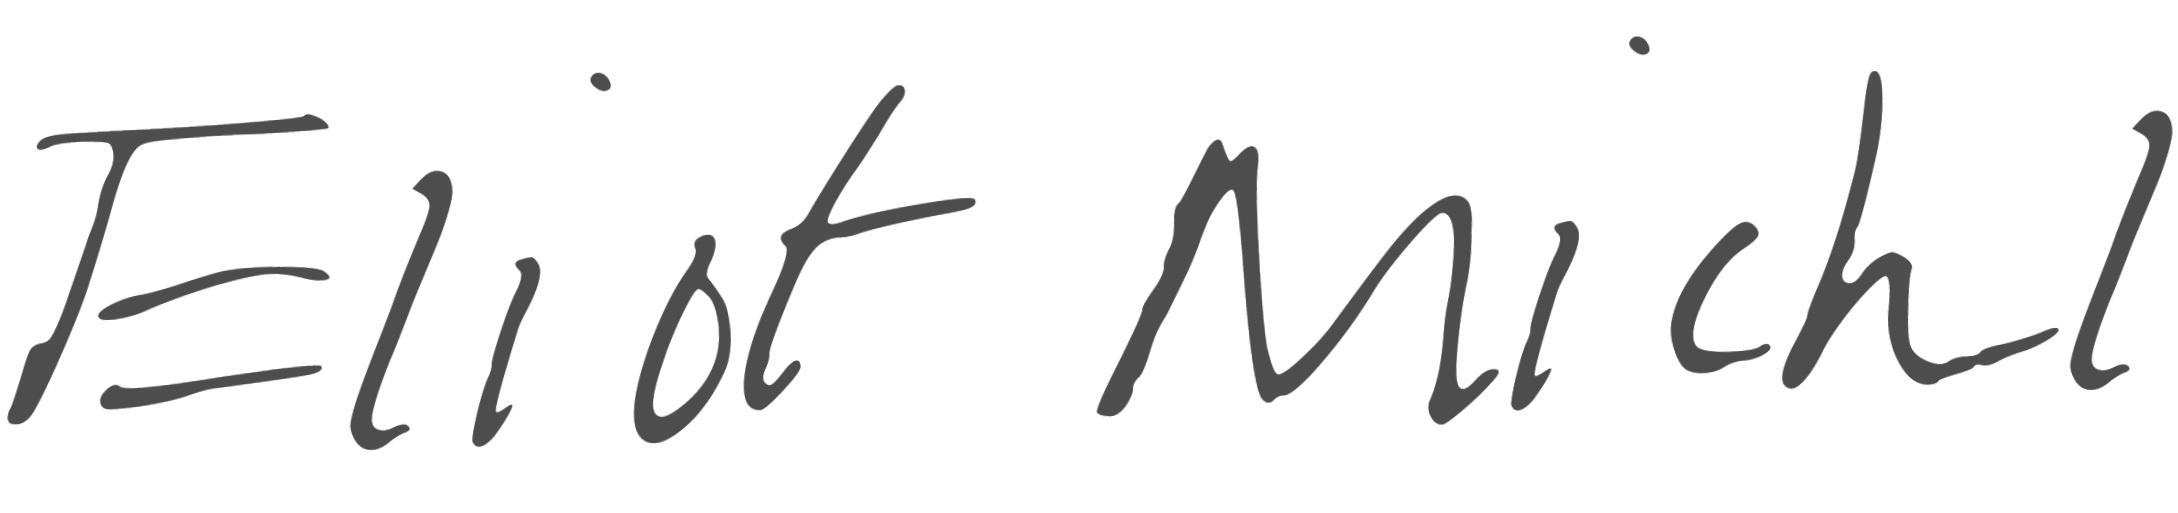 eliot-michl-sig-logo.jpg